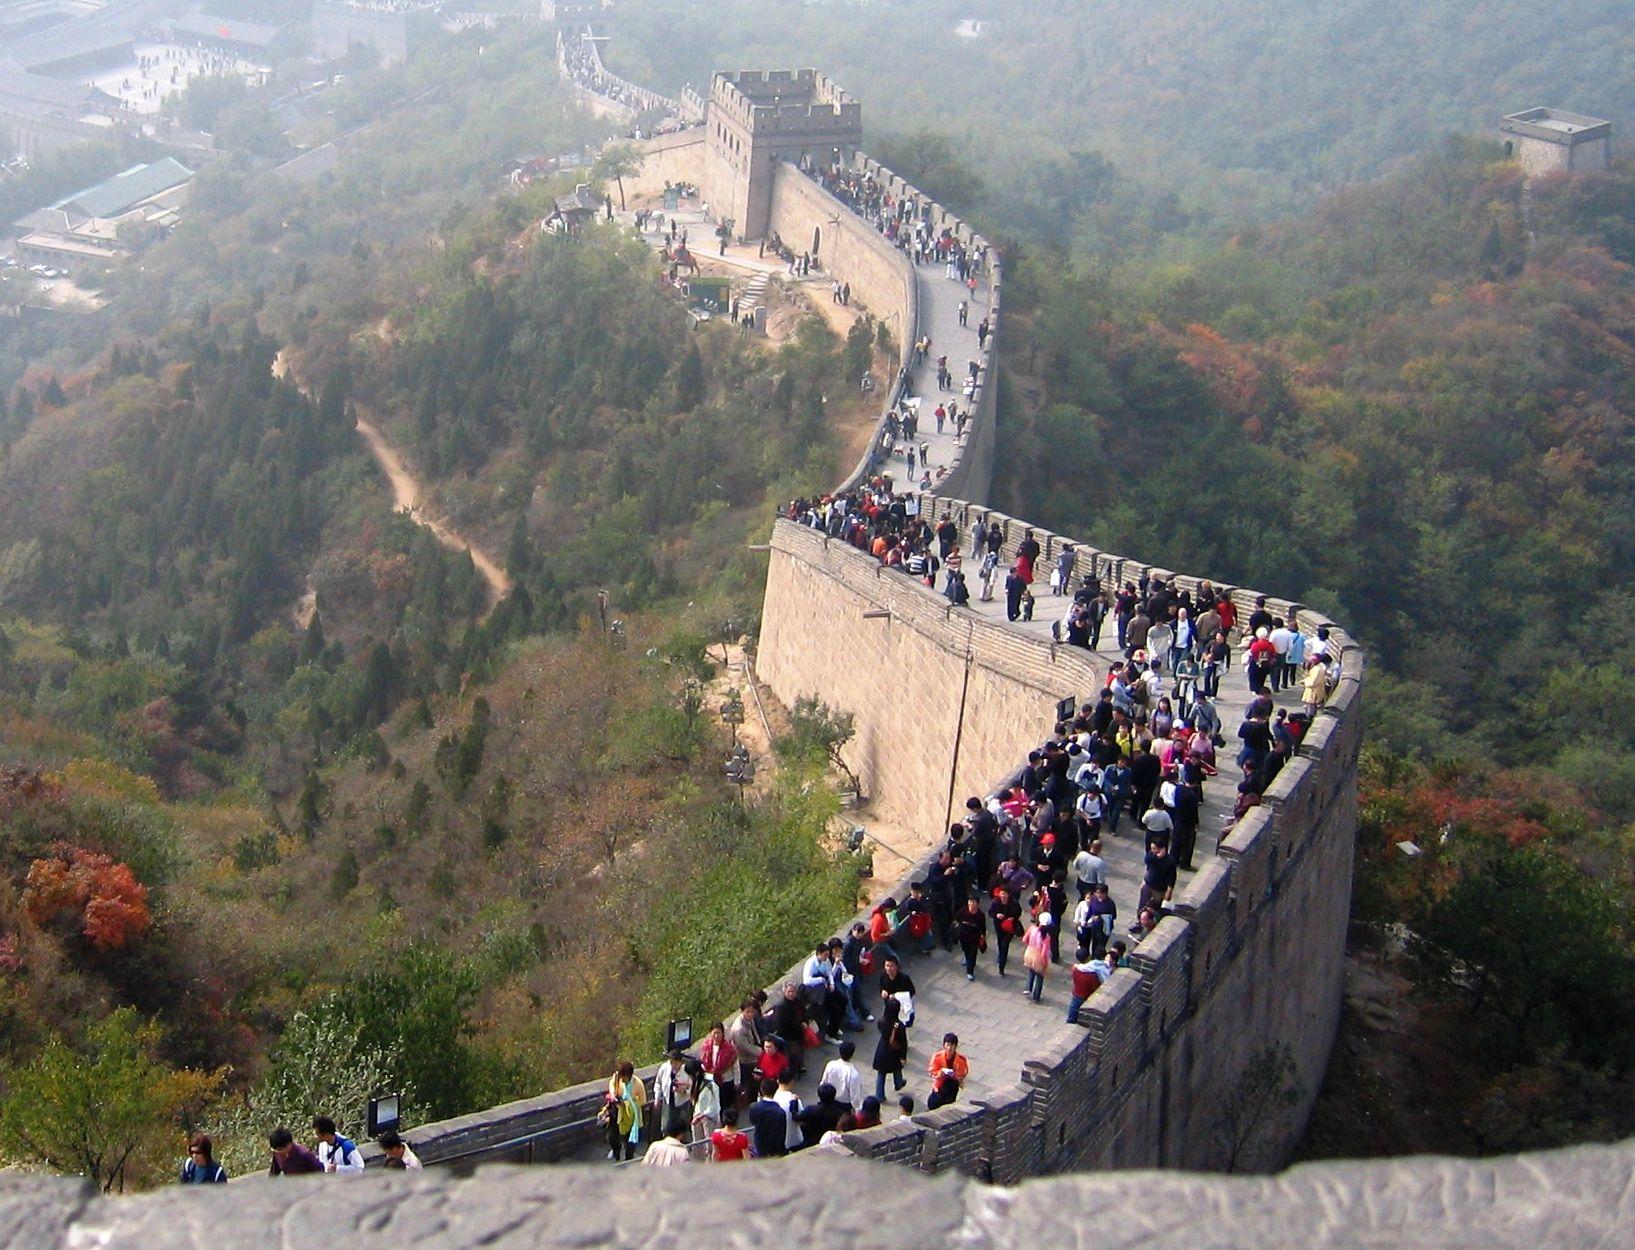 Застава Бадалин на Великой Китайской стене